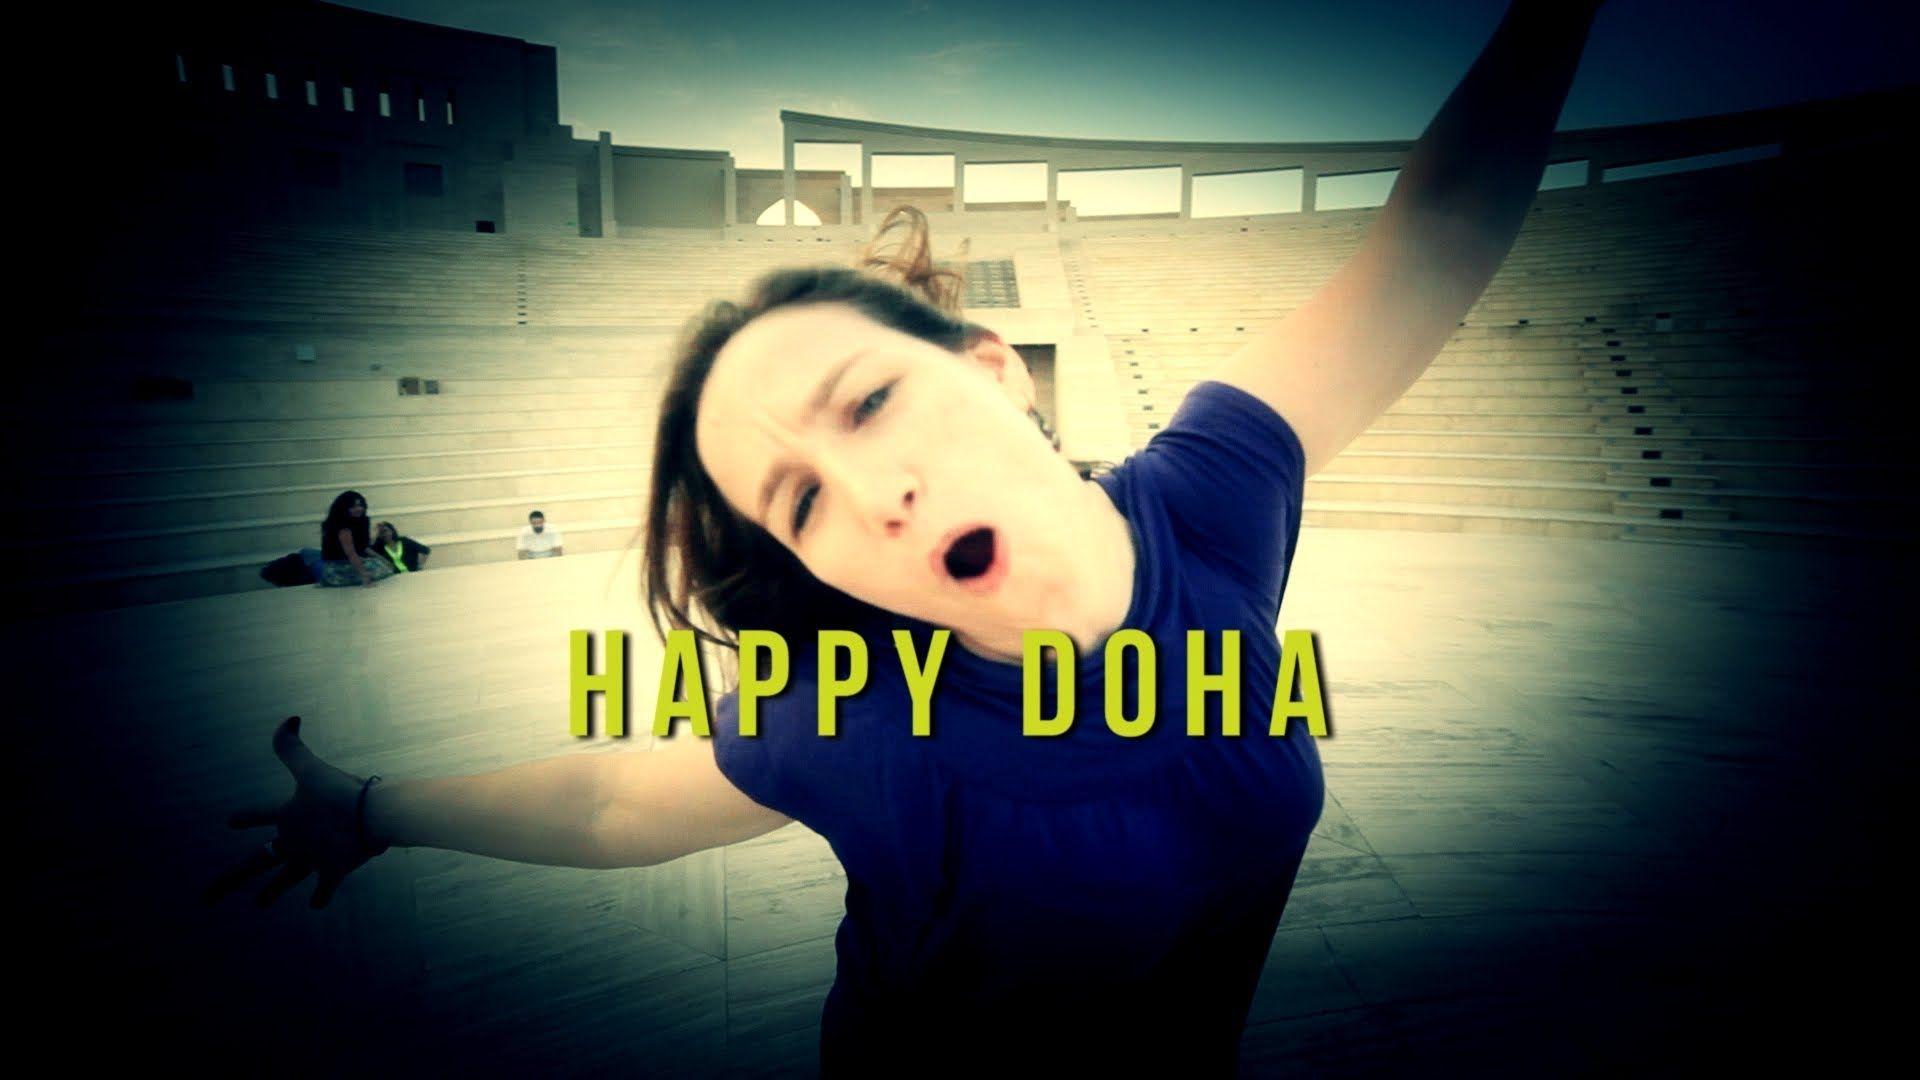 DOHA TRENDS - #HAPPYDAY - WE ARE HAPPY IN DOHA, QATAR